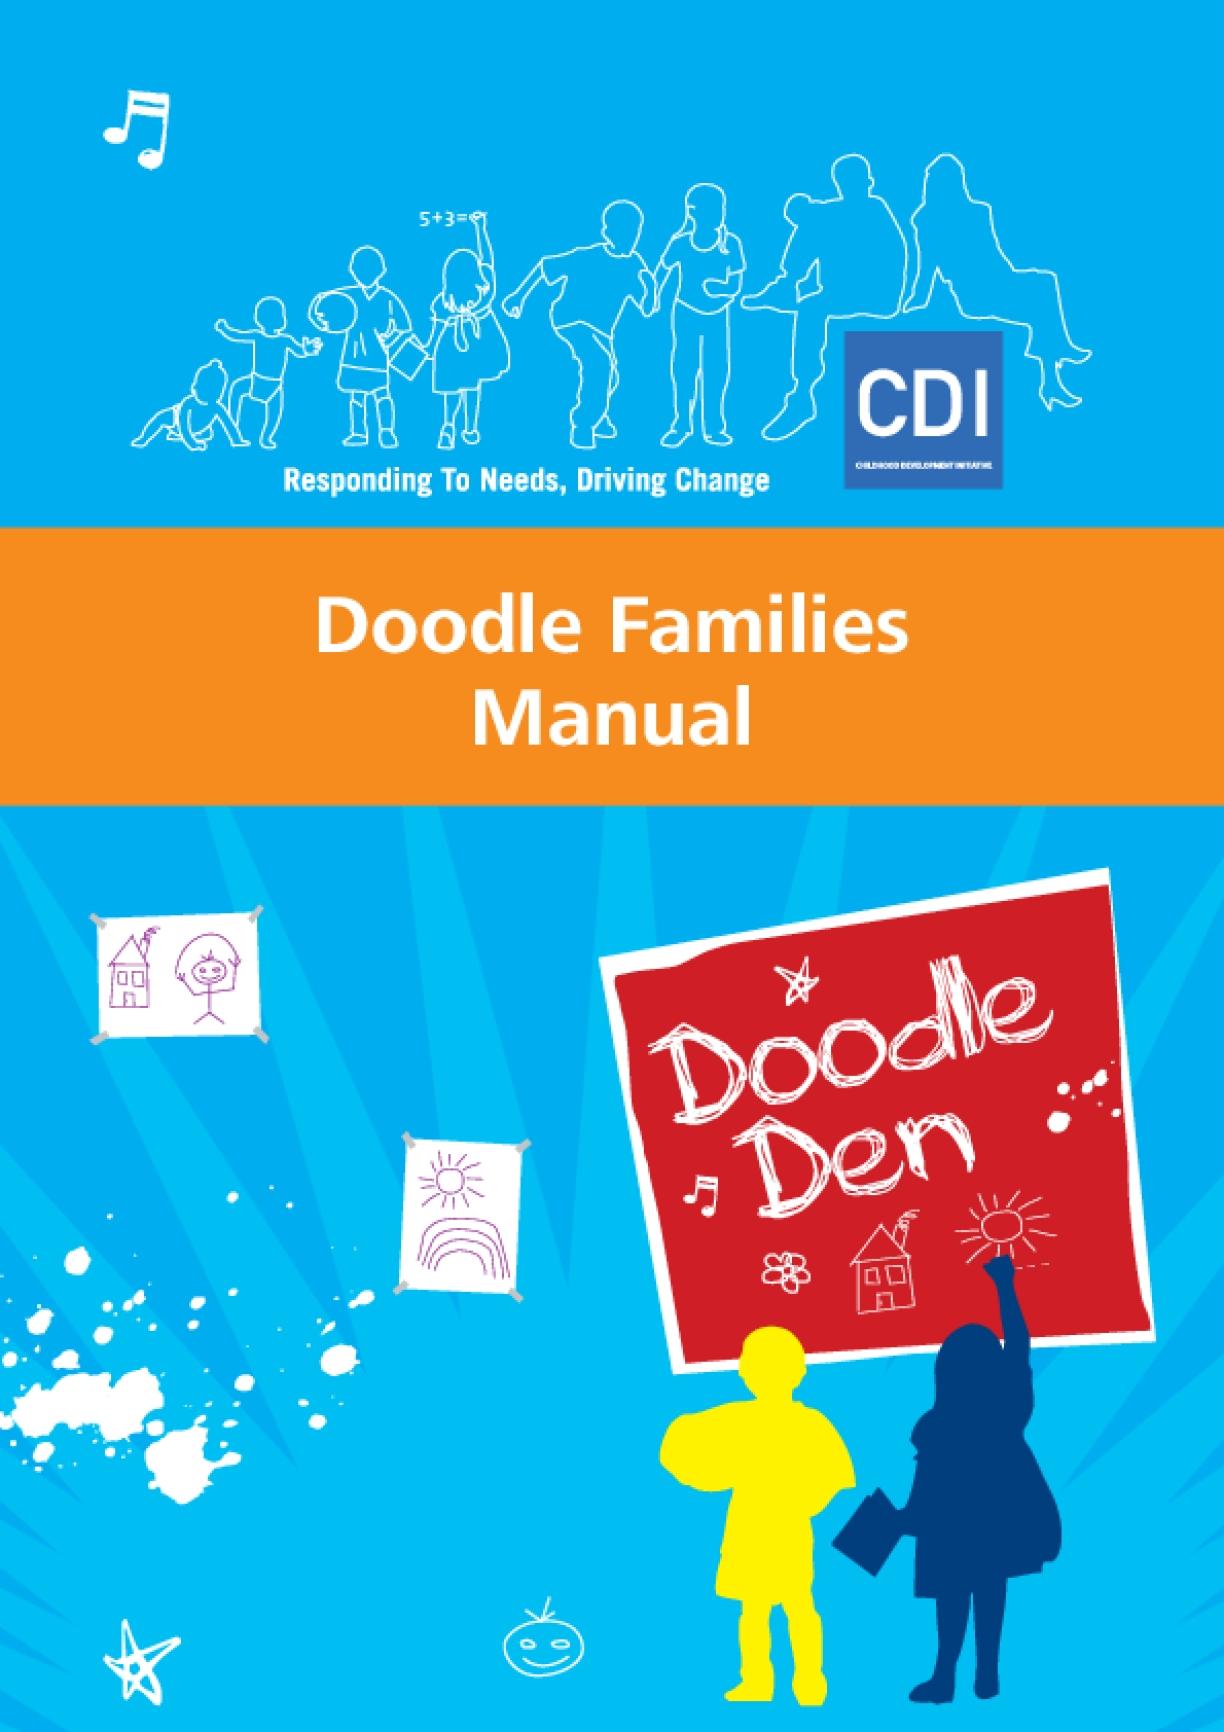 Doodle Families Manual